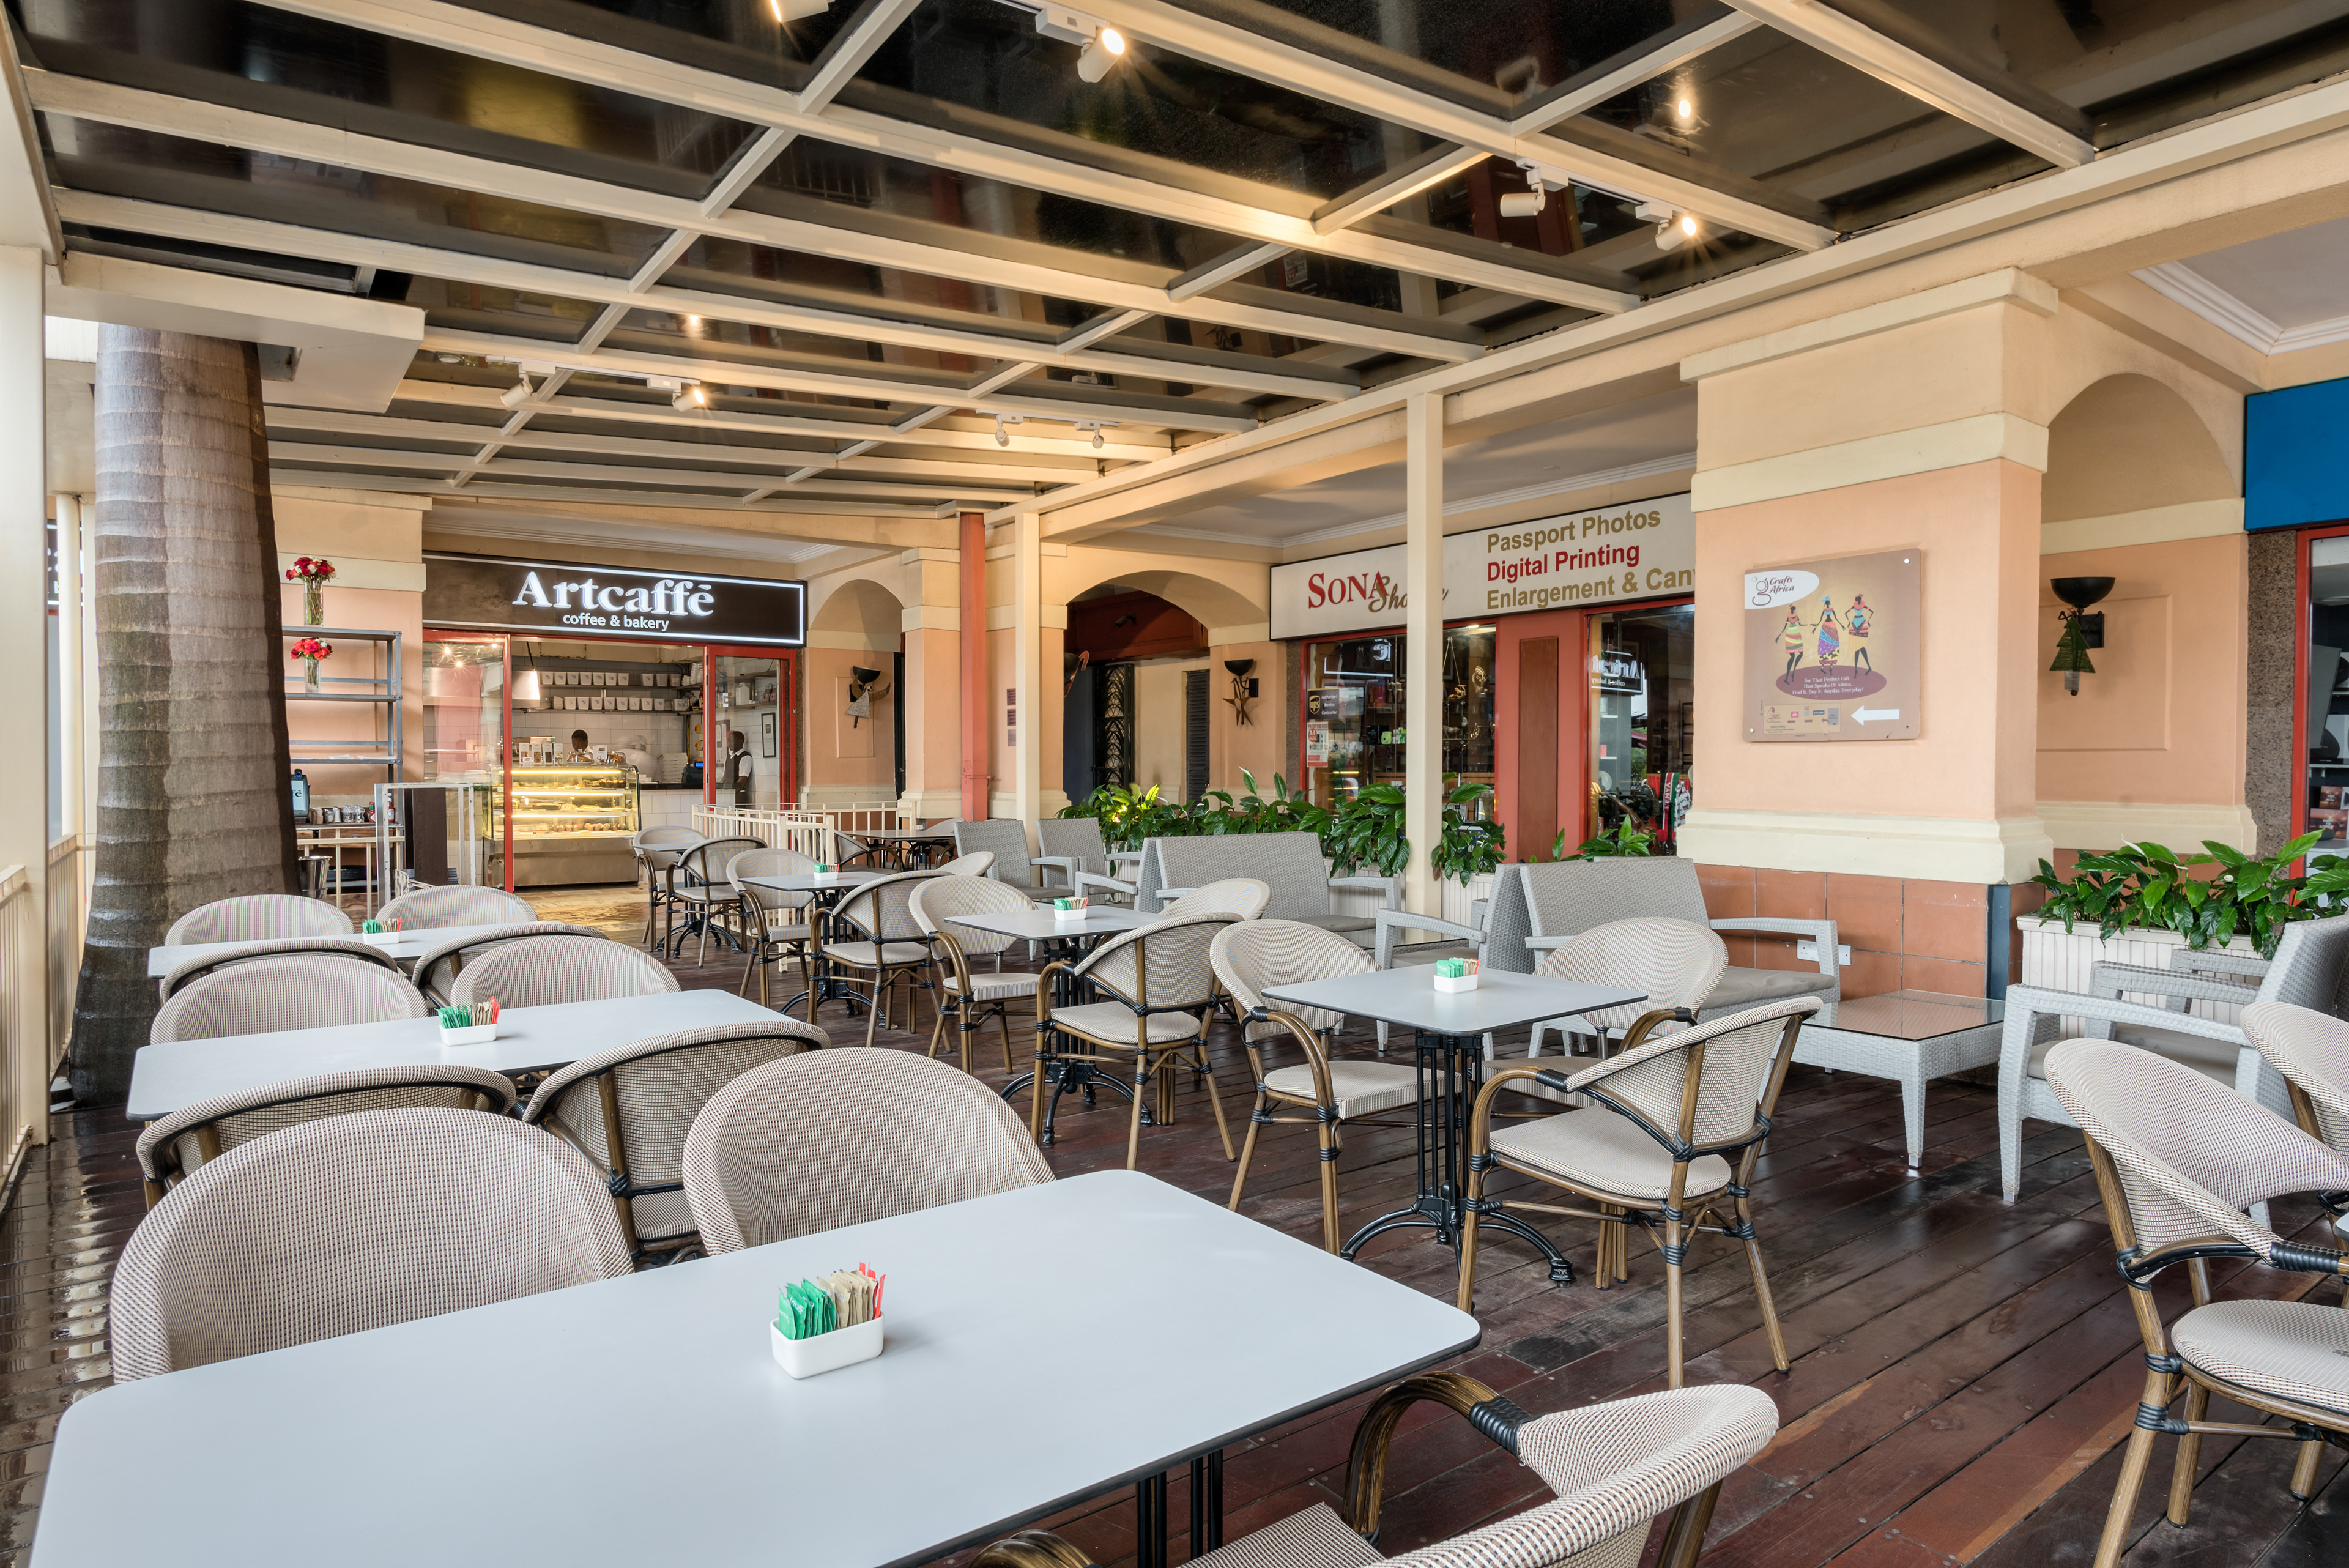 mobb studio  artcaffe  urban burger  galleria mall